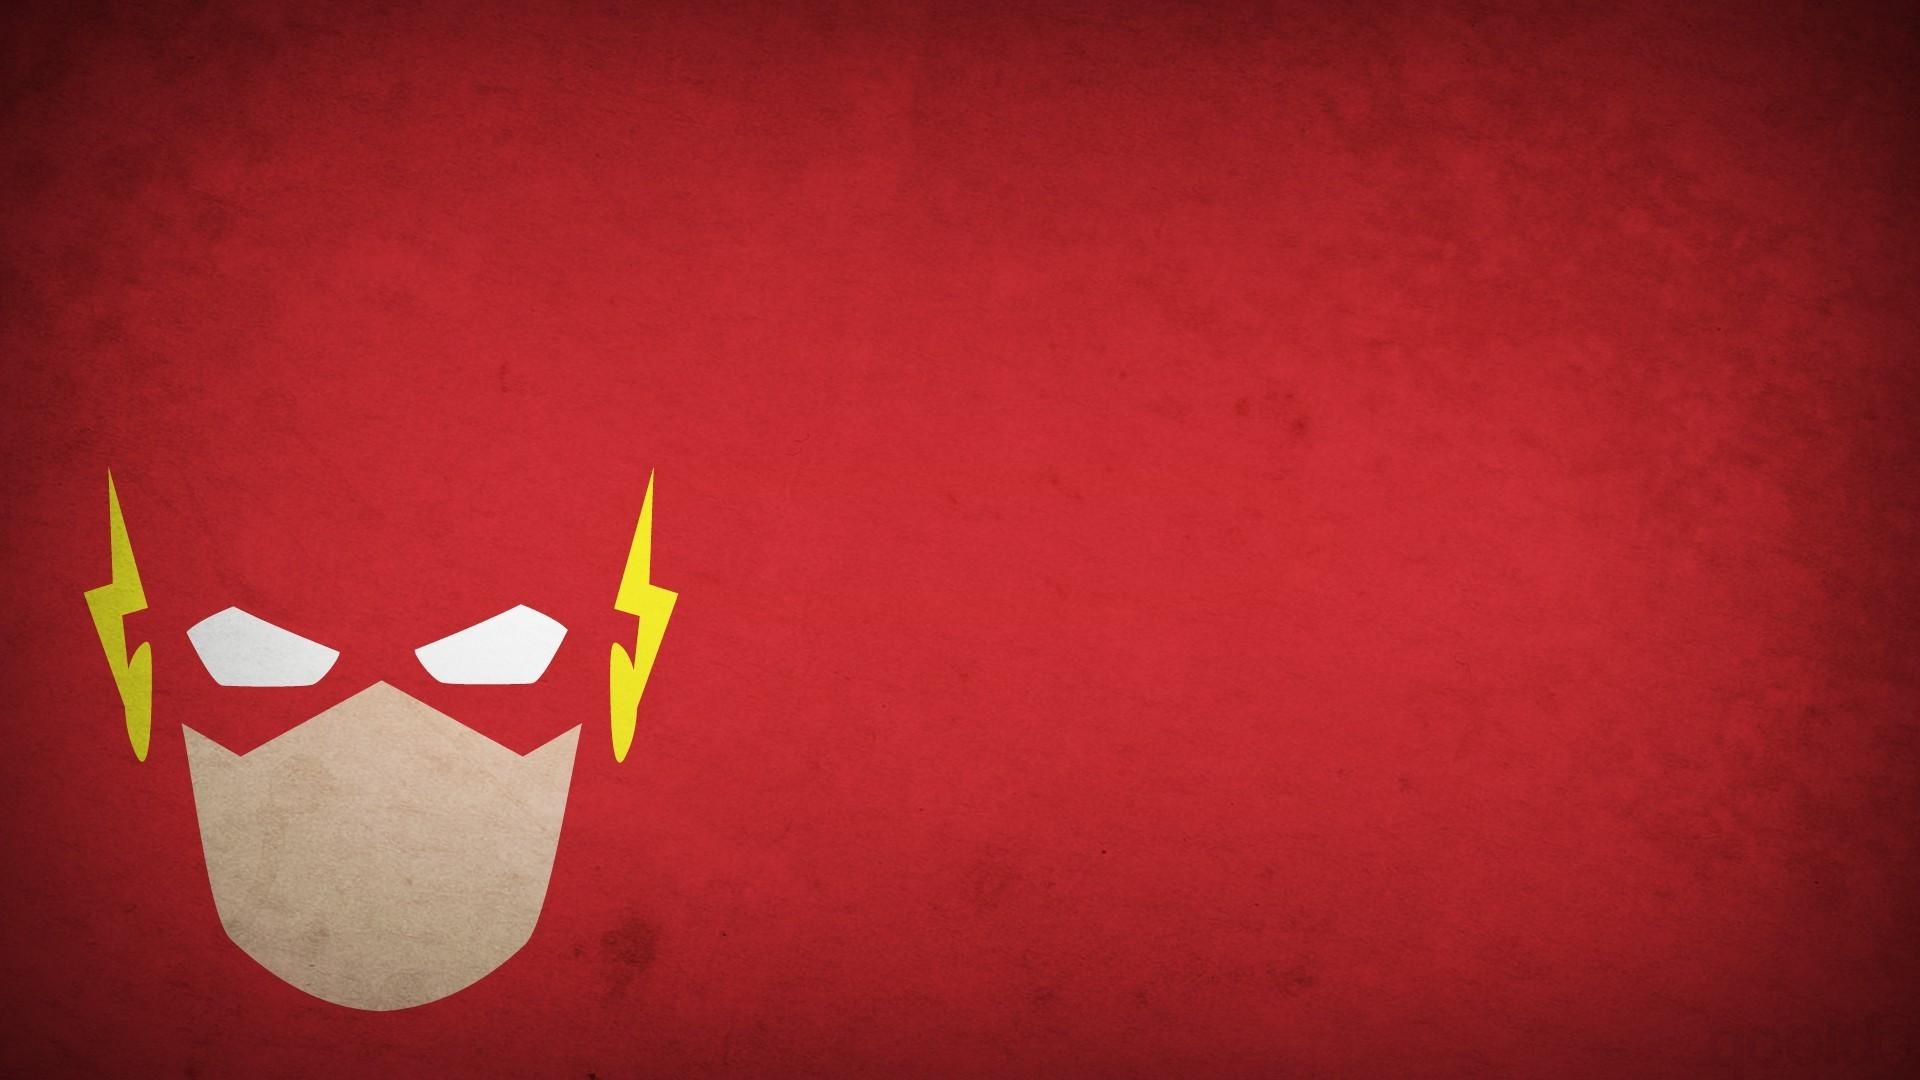 simple Background, Comics, DC Comics, Heroes, Flash, Blo0p, Minimalism,